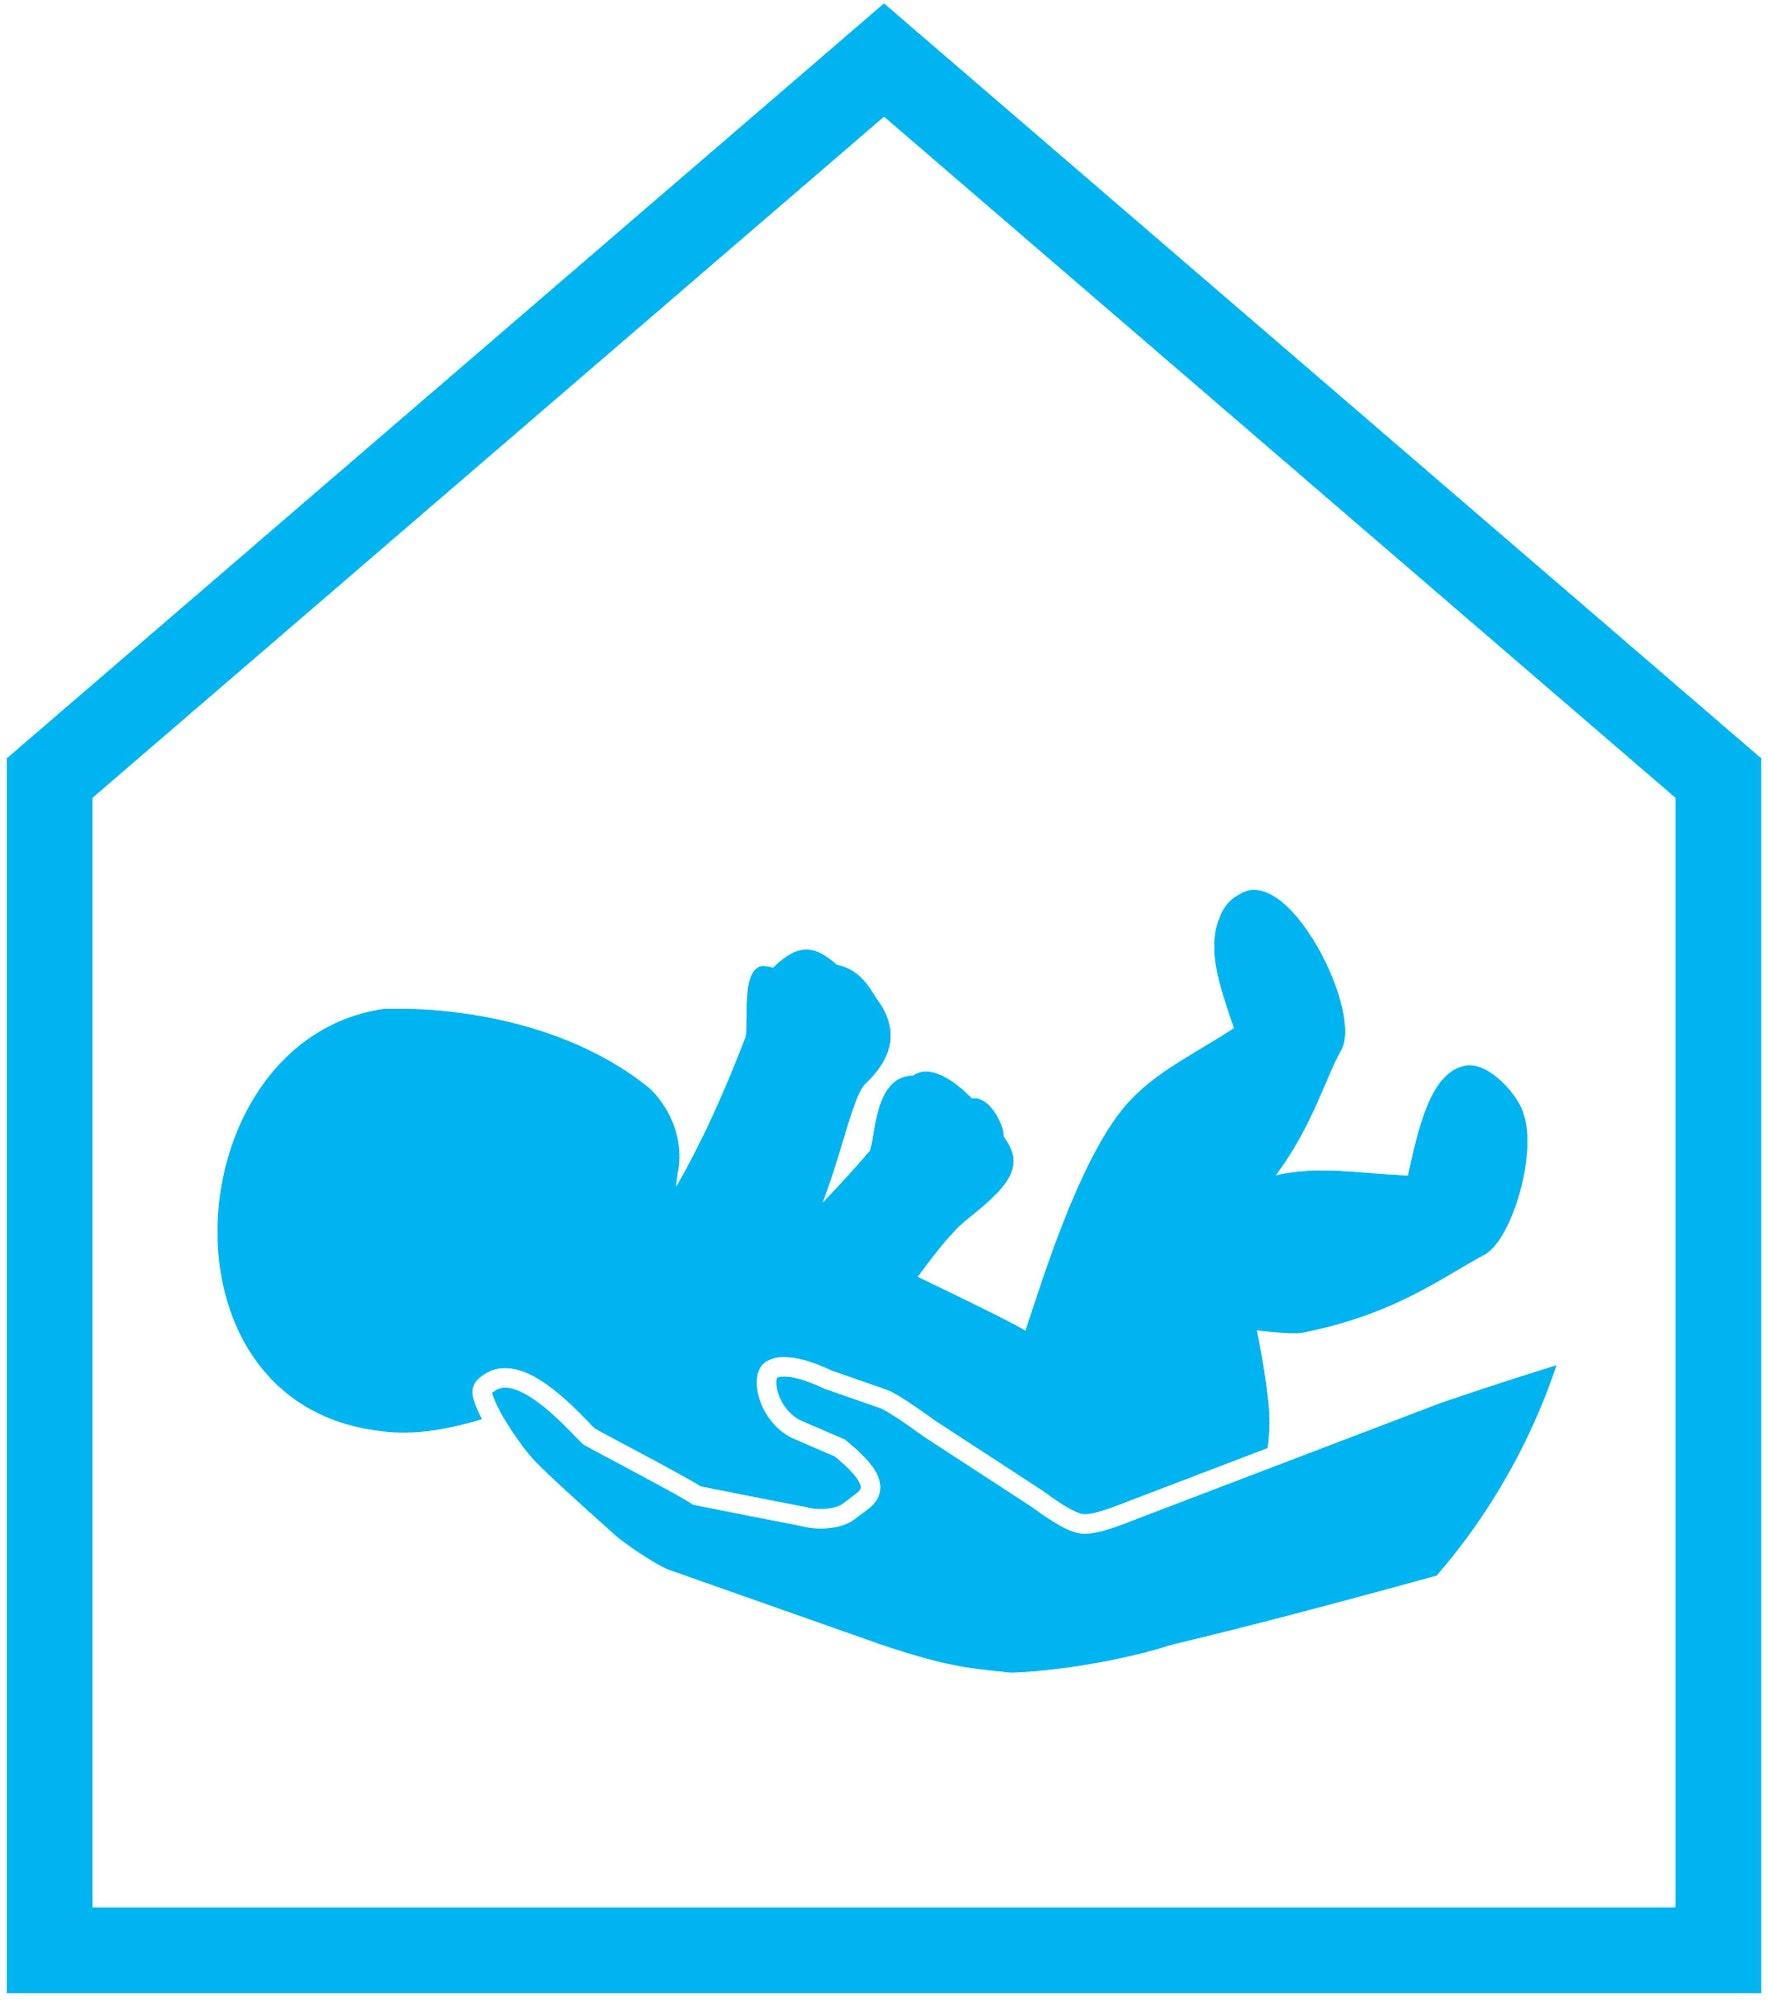 sign, infant in hands, safe surrender site logo, baby blue and white logo